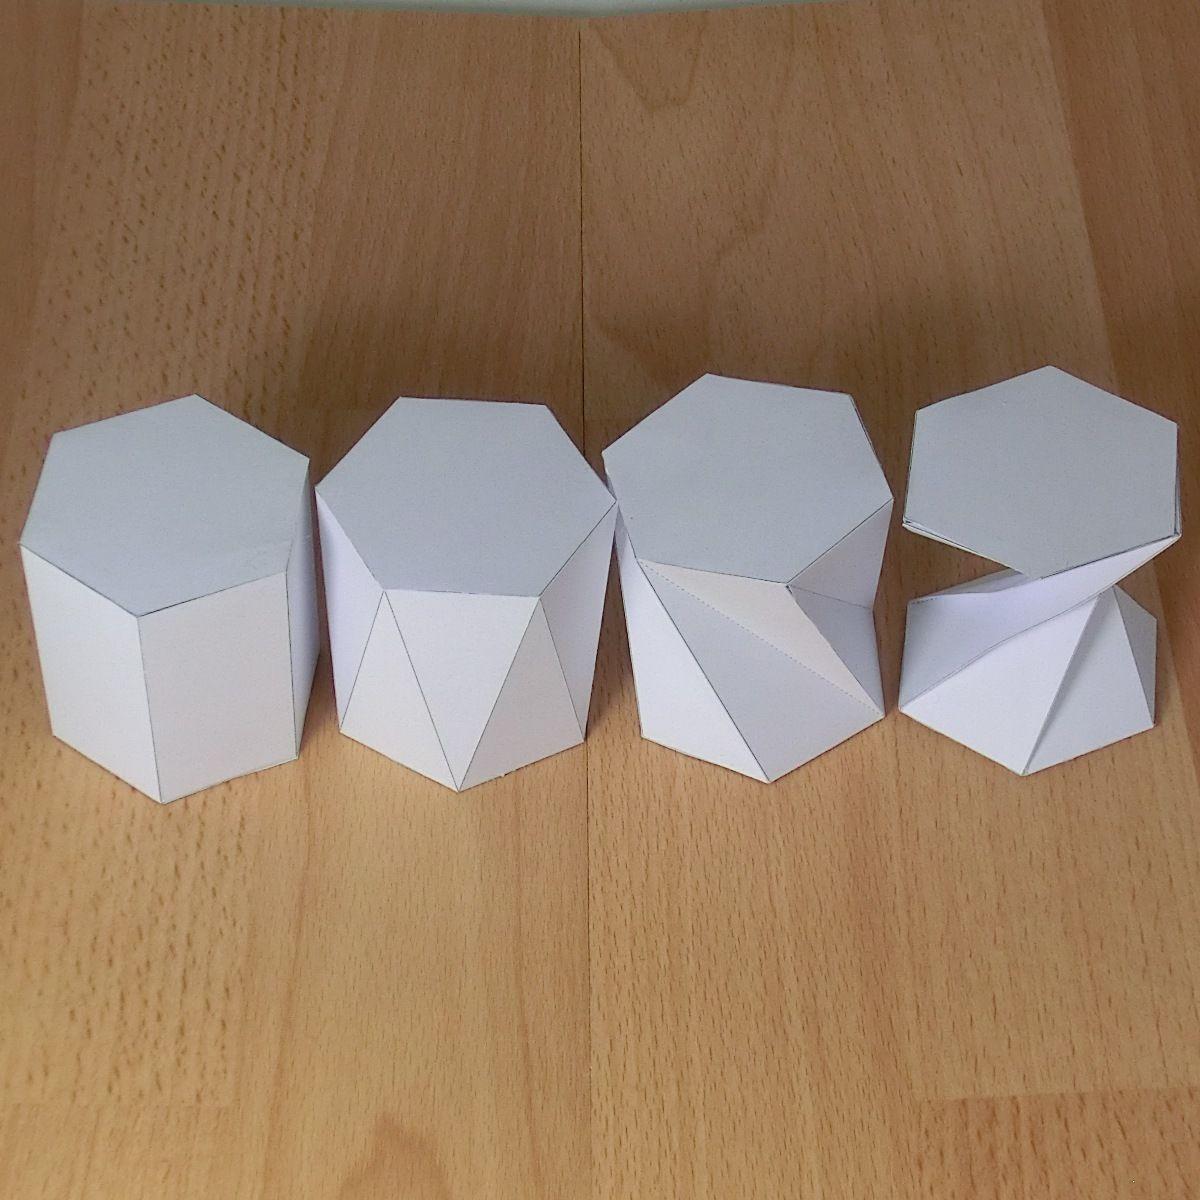 four (twisted) hexagonal prisms | HB - DIY gift ideas ... - photo#50